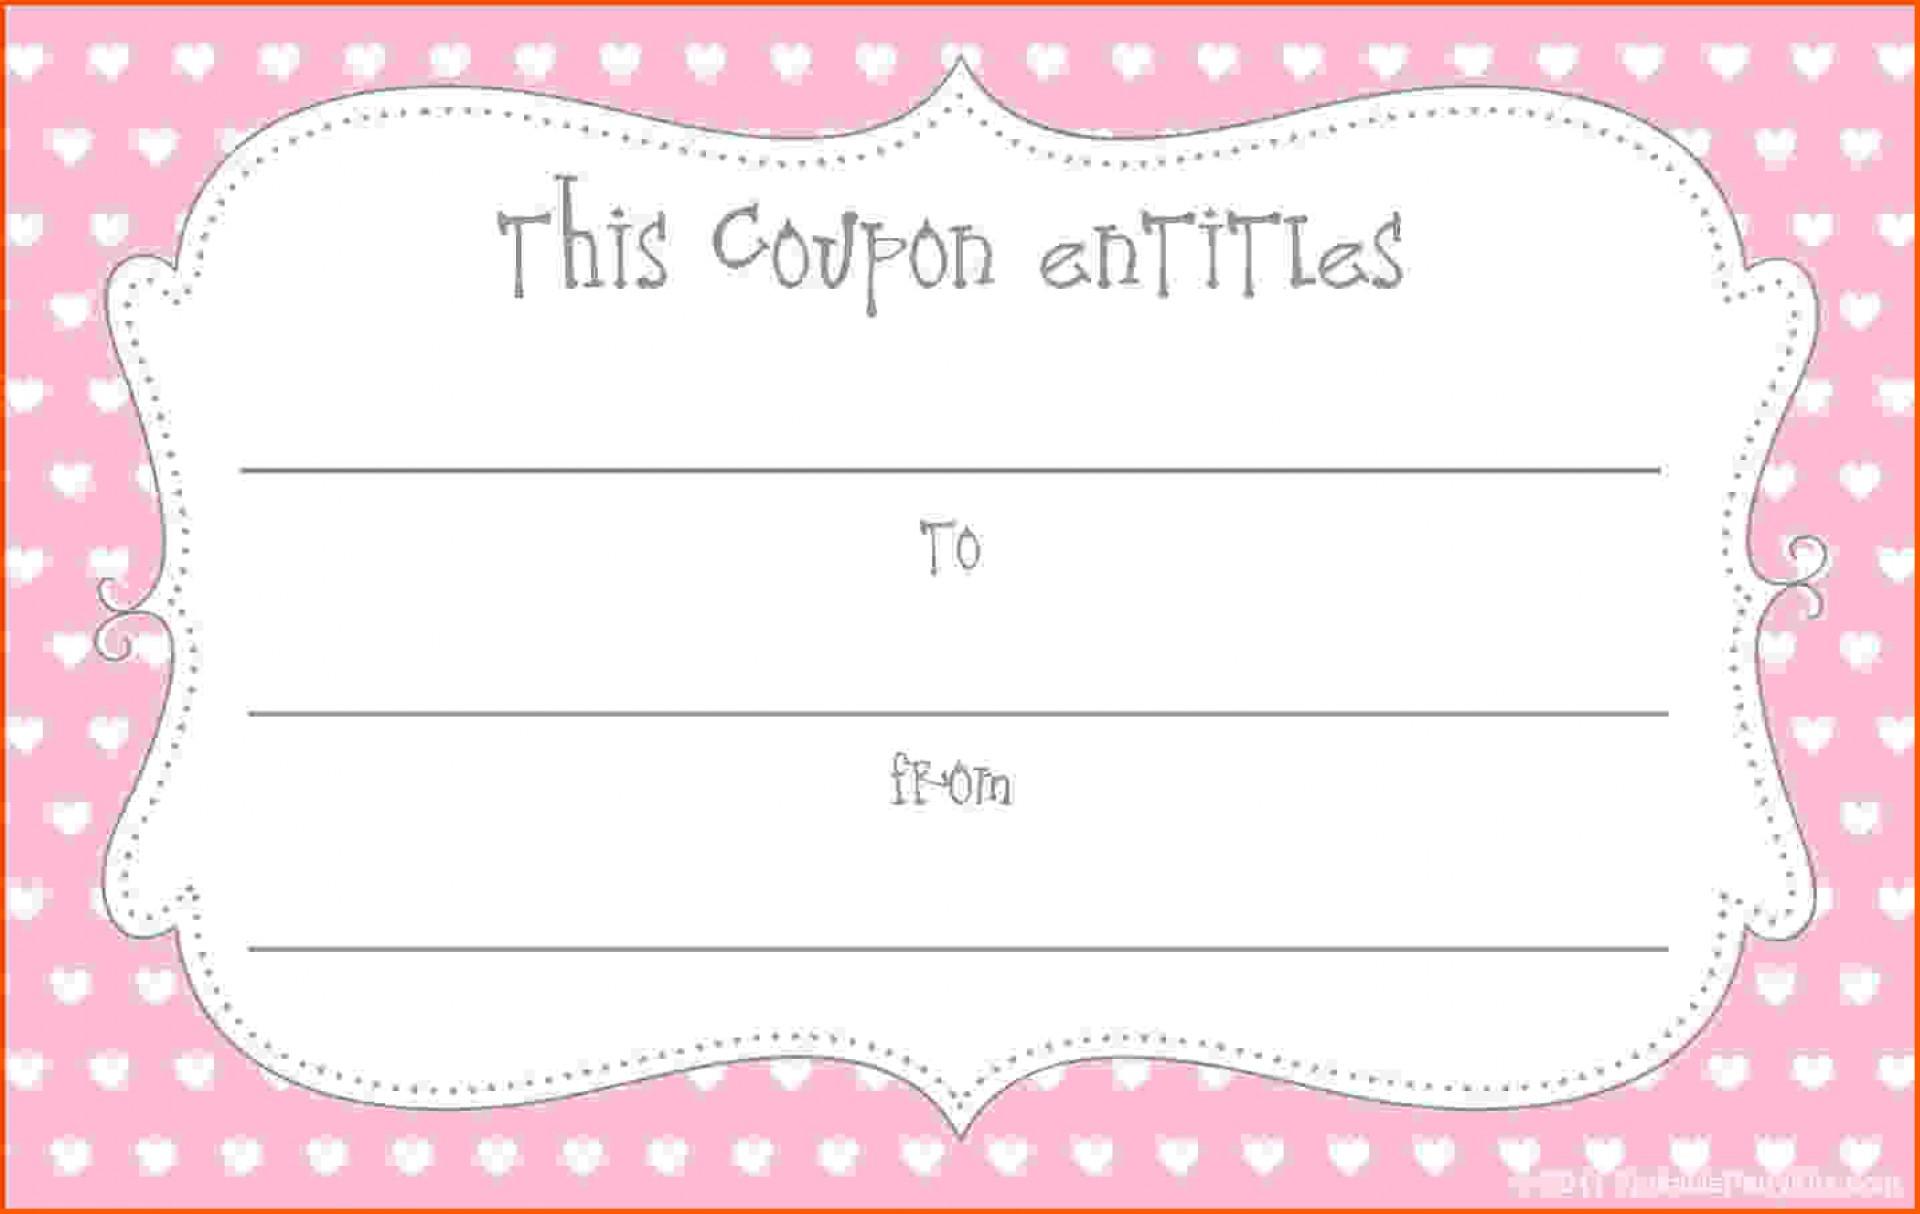 010 Free Printable Coupon Templates Template Ideas Valentine - Free Printable Coupon Templates